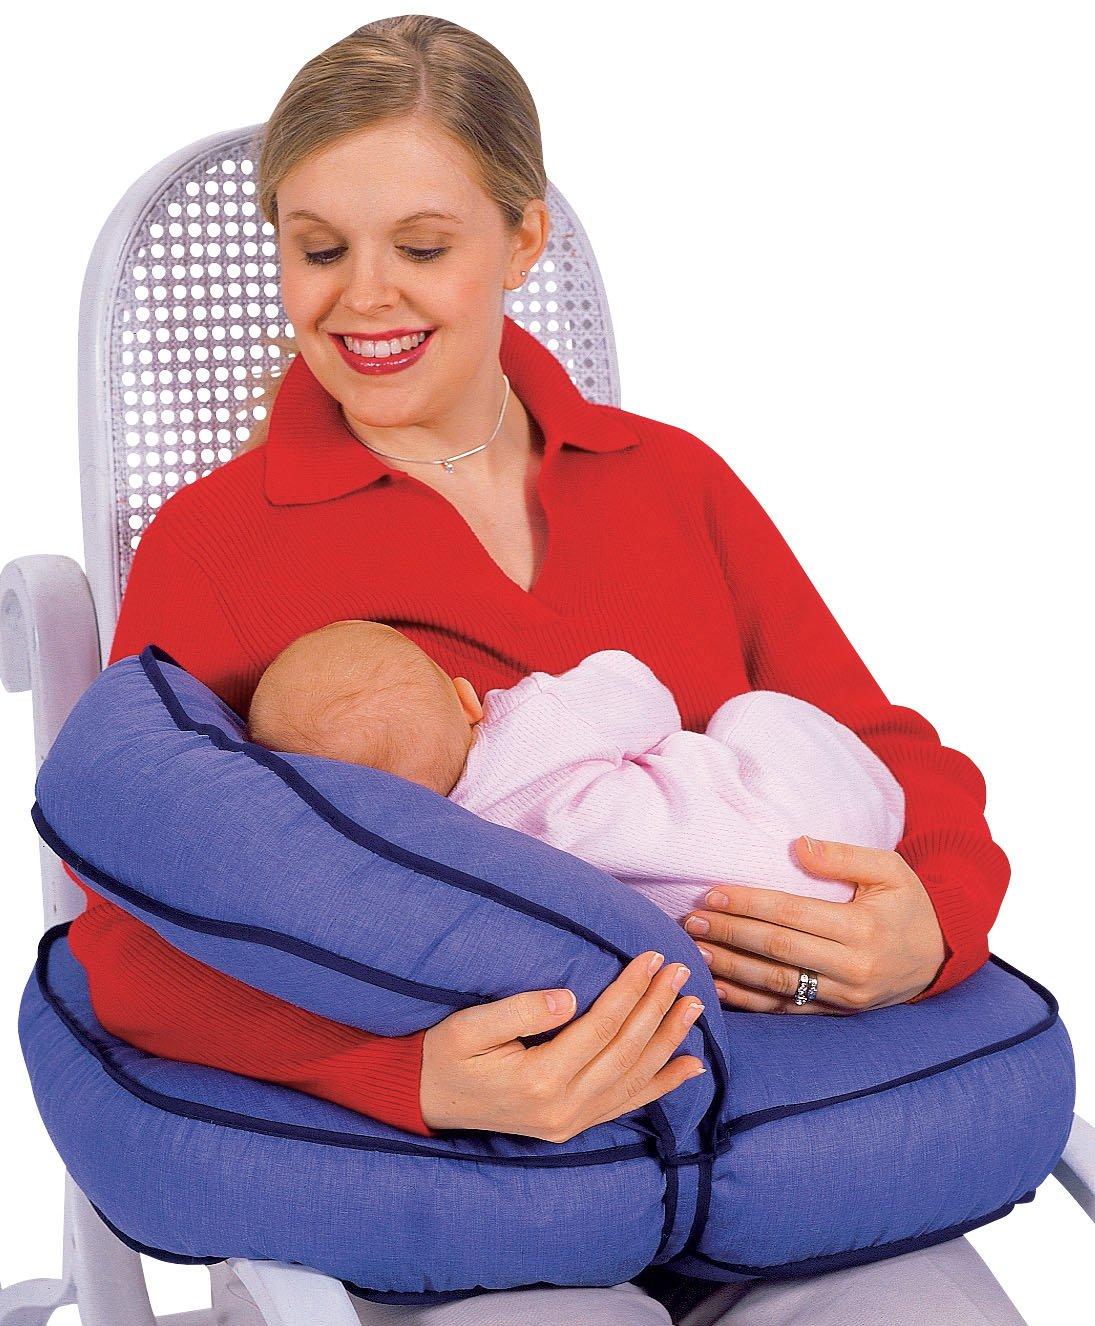 Leachco Natural Boost - Adjustable Nursing Pillow - Denim by Leachco